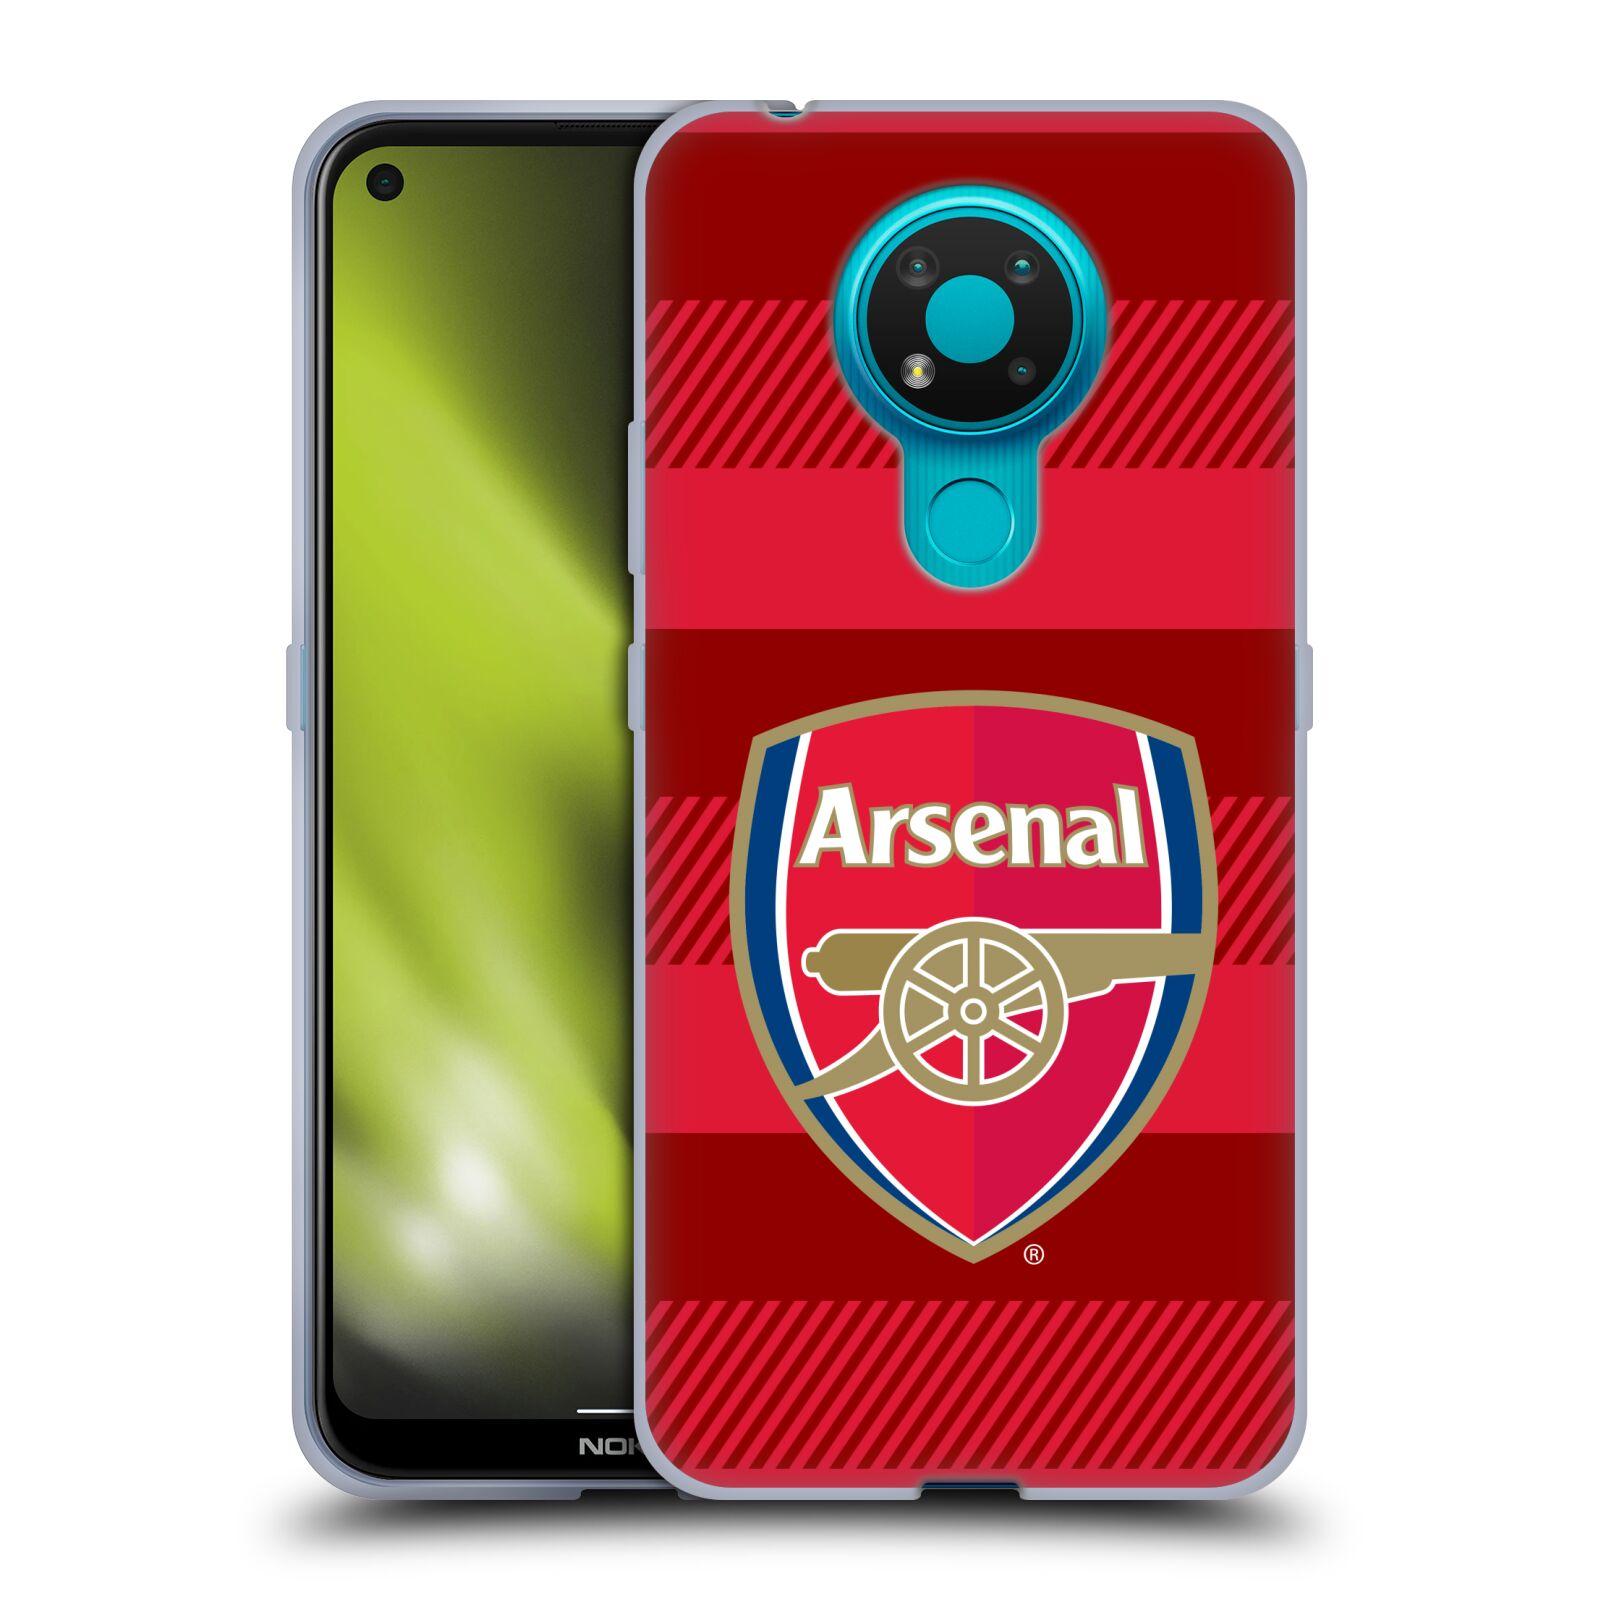 Silikonové pouzdro na mobil Nokia 3.4 - Head Case - Arsenal FC - Logo s pruhy